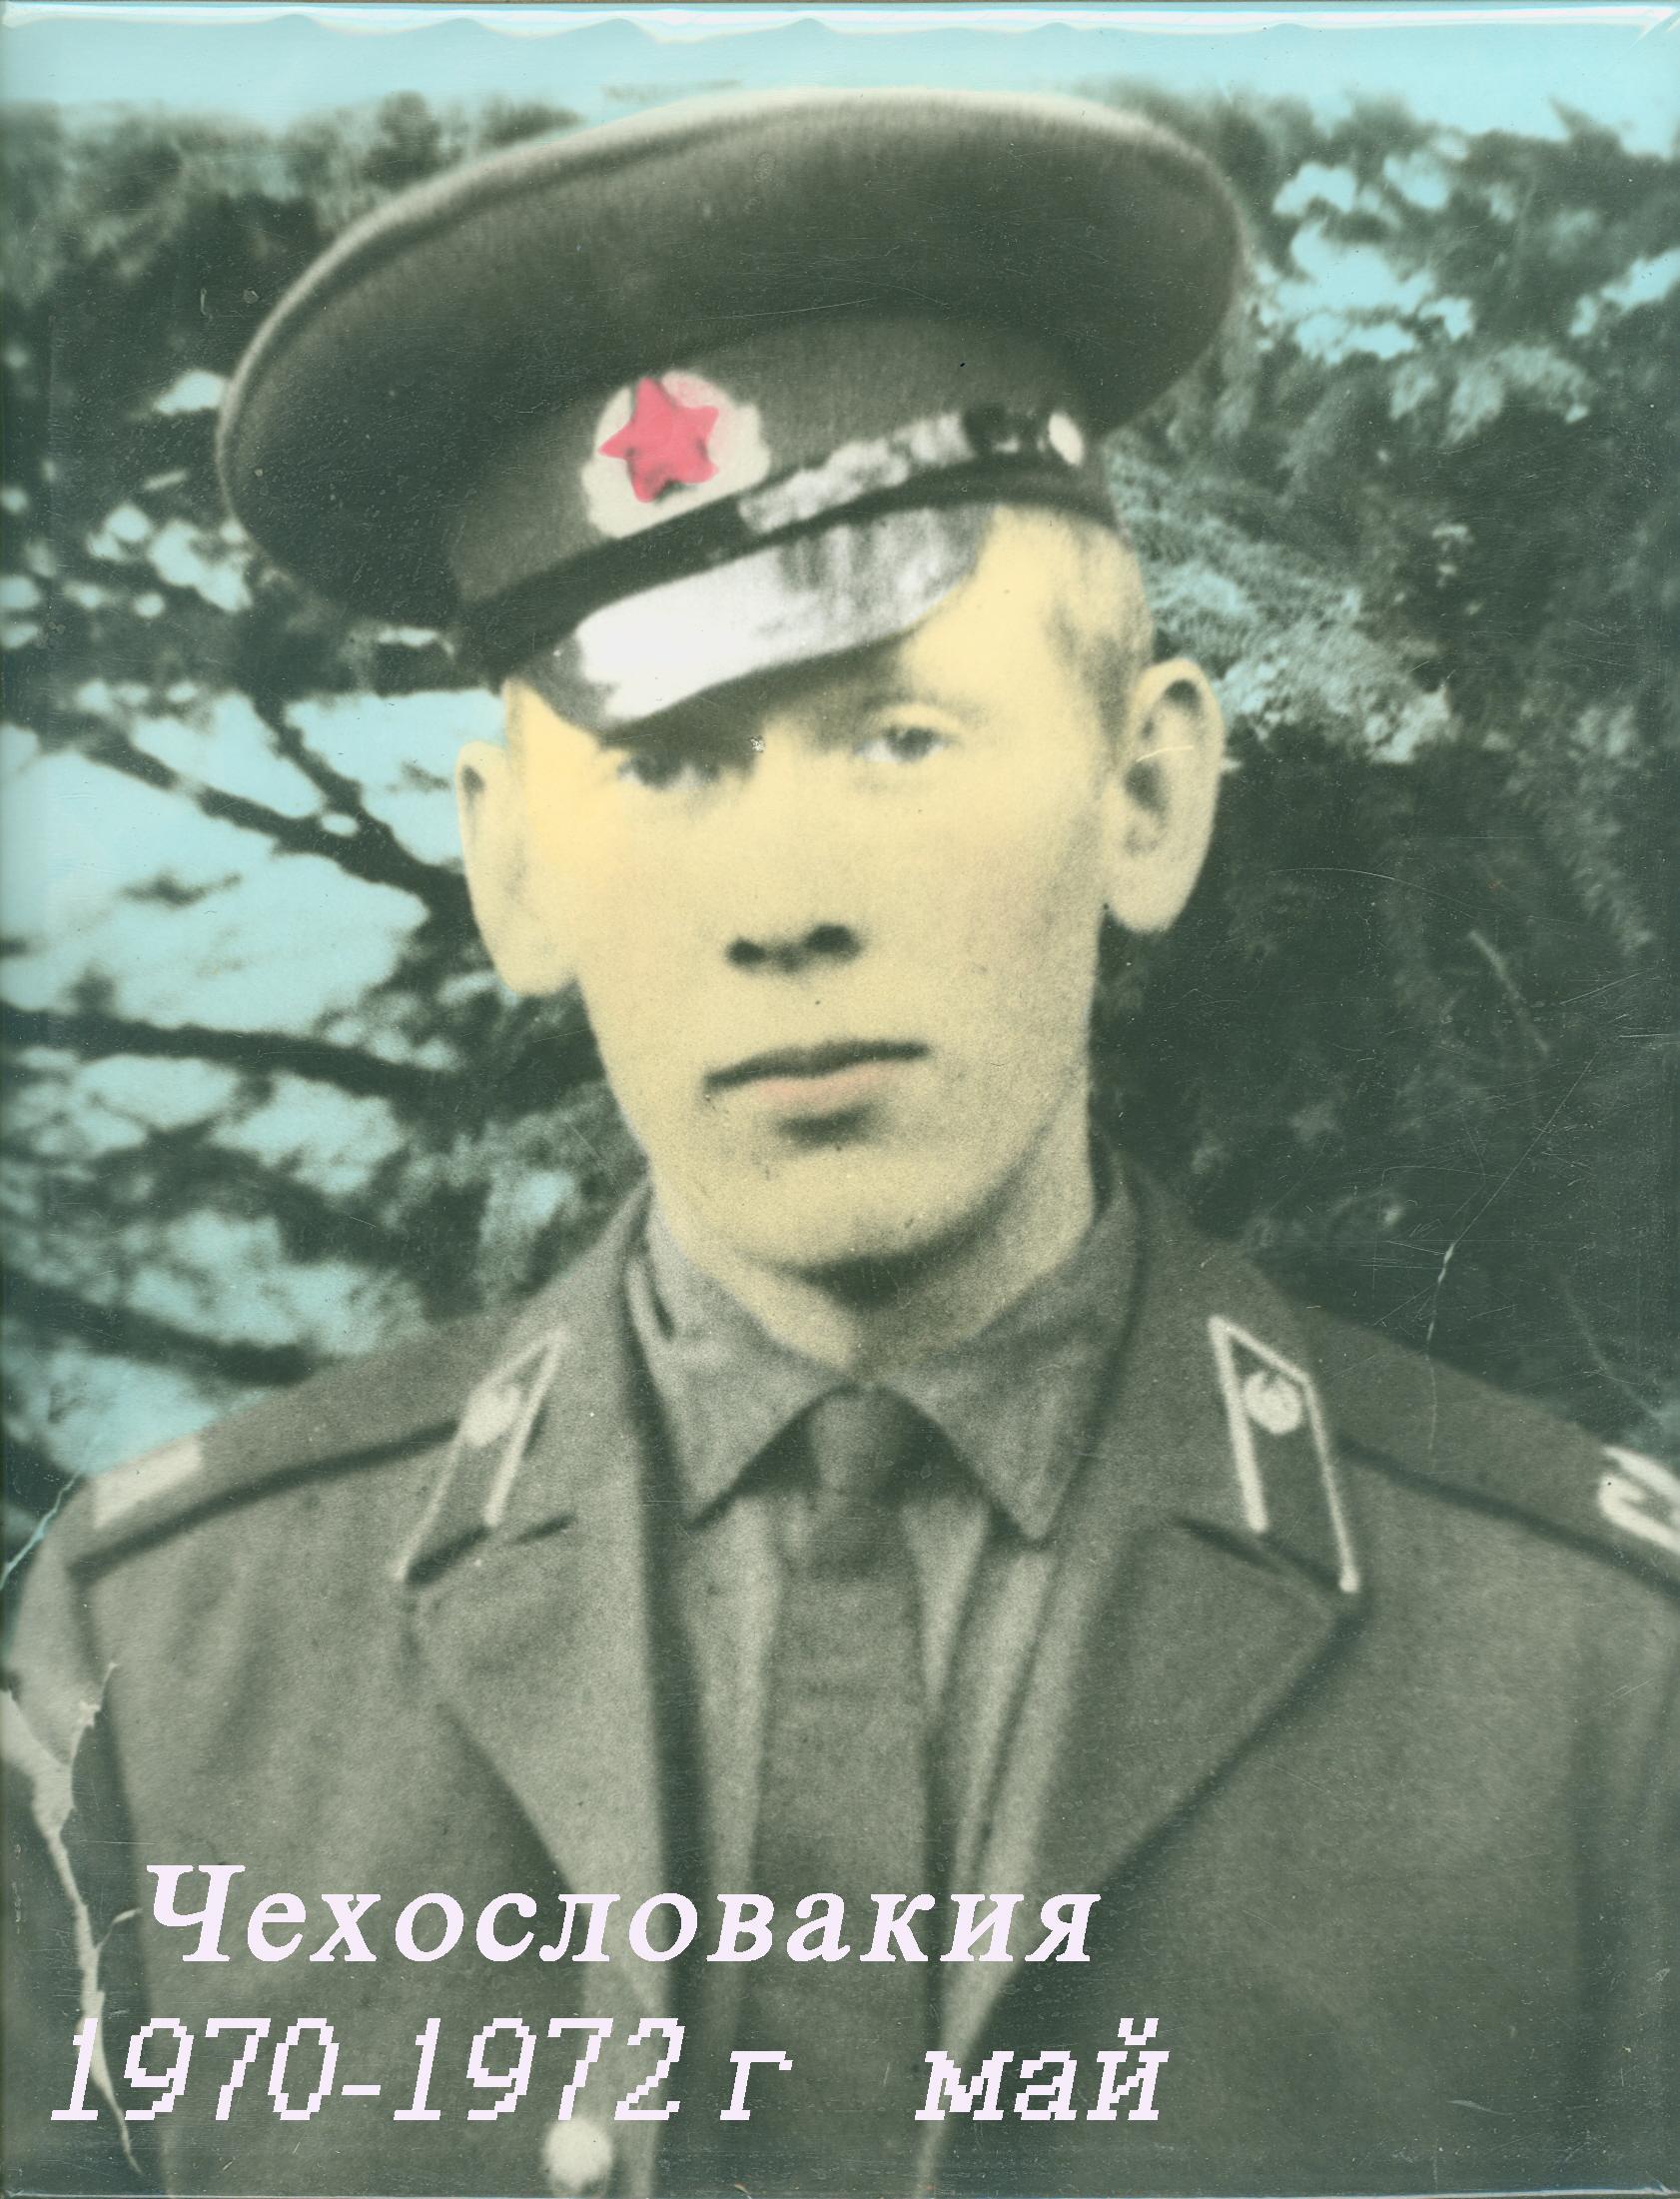 Флюр Миргазтдинов